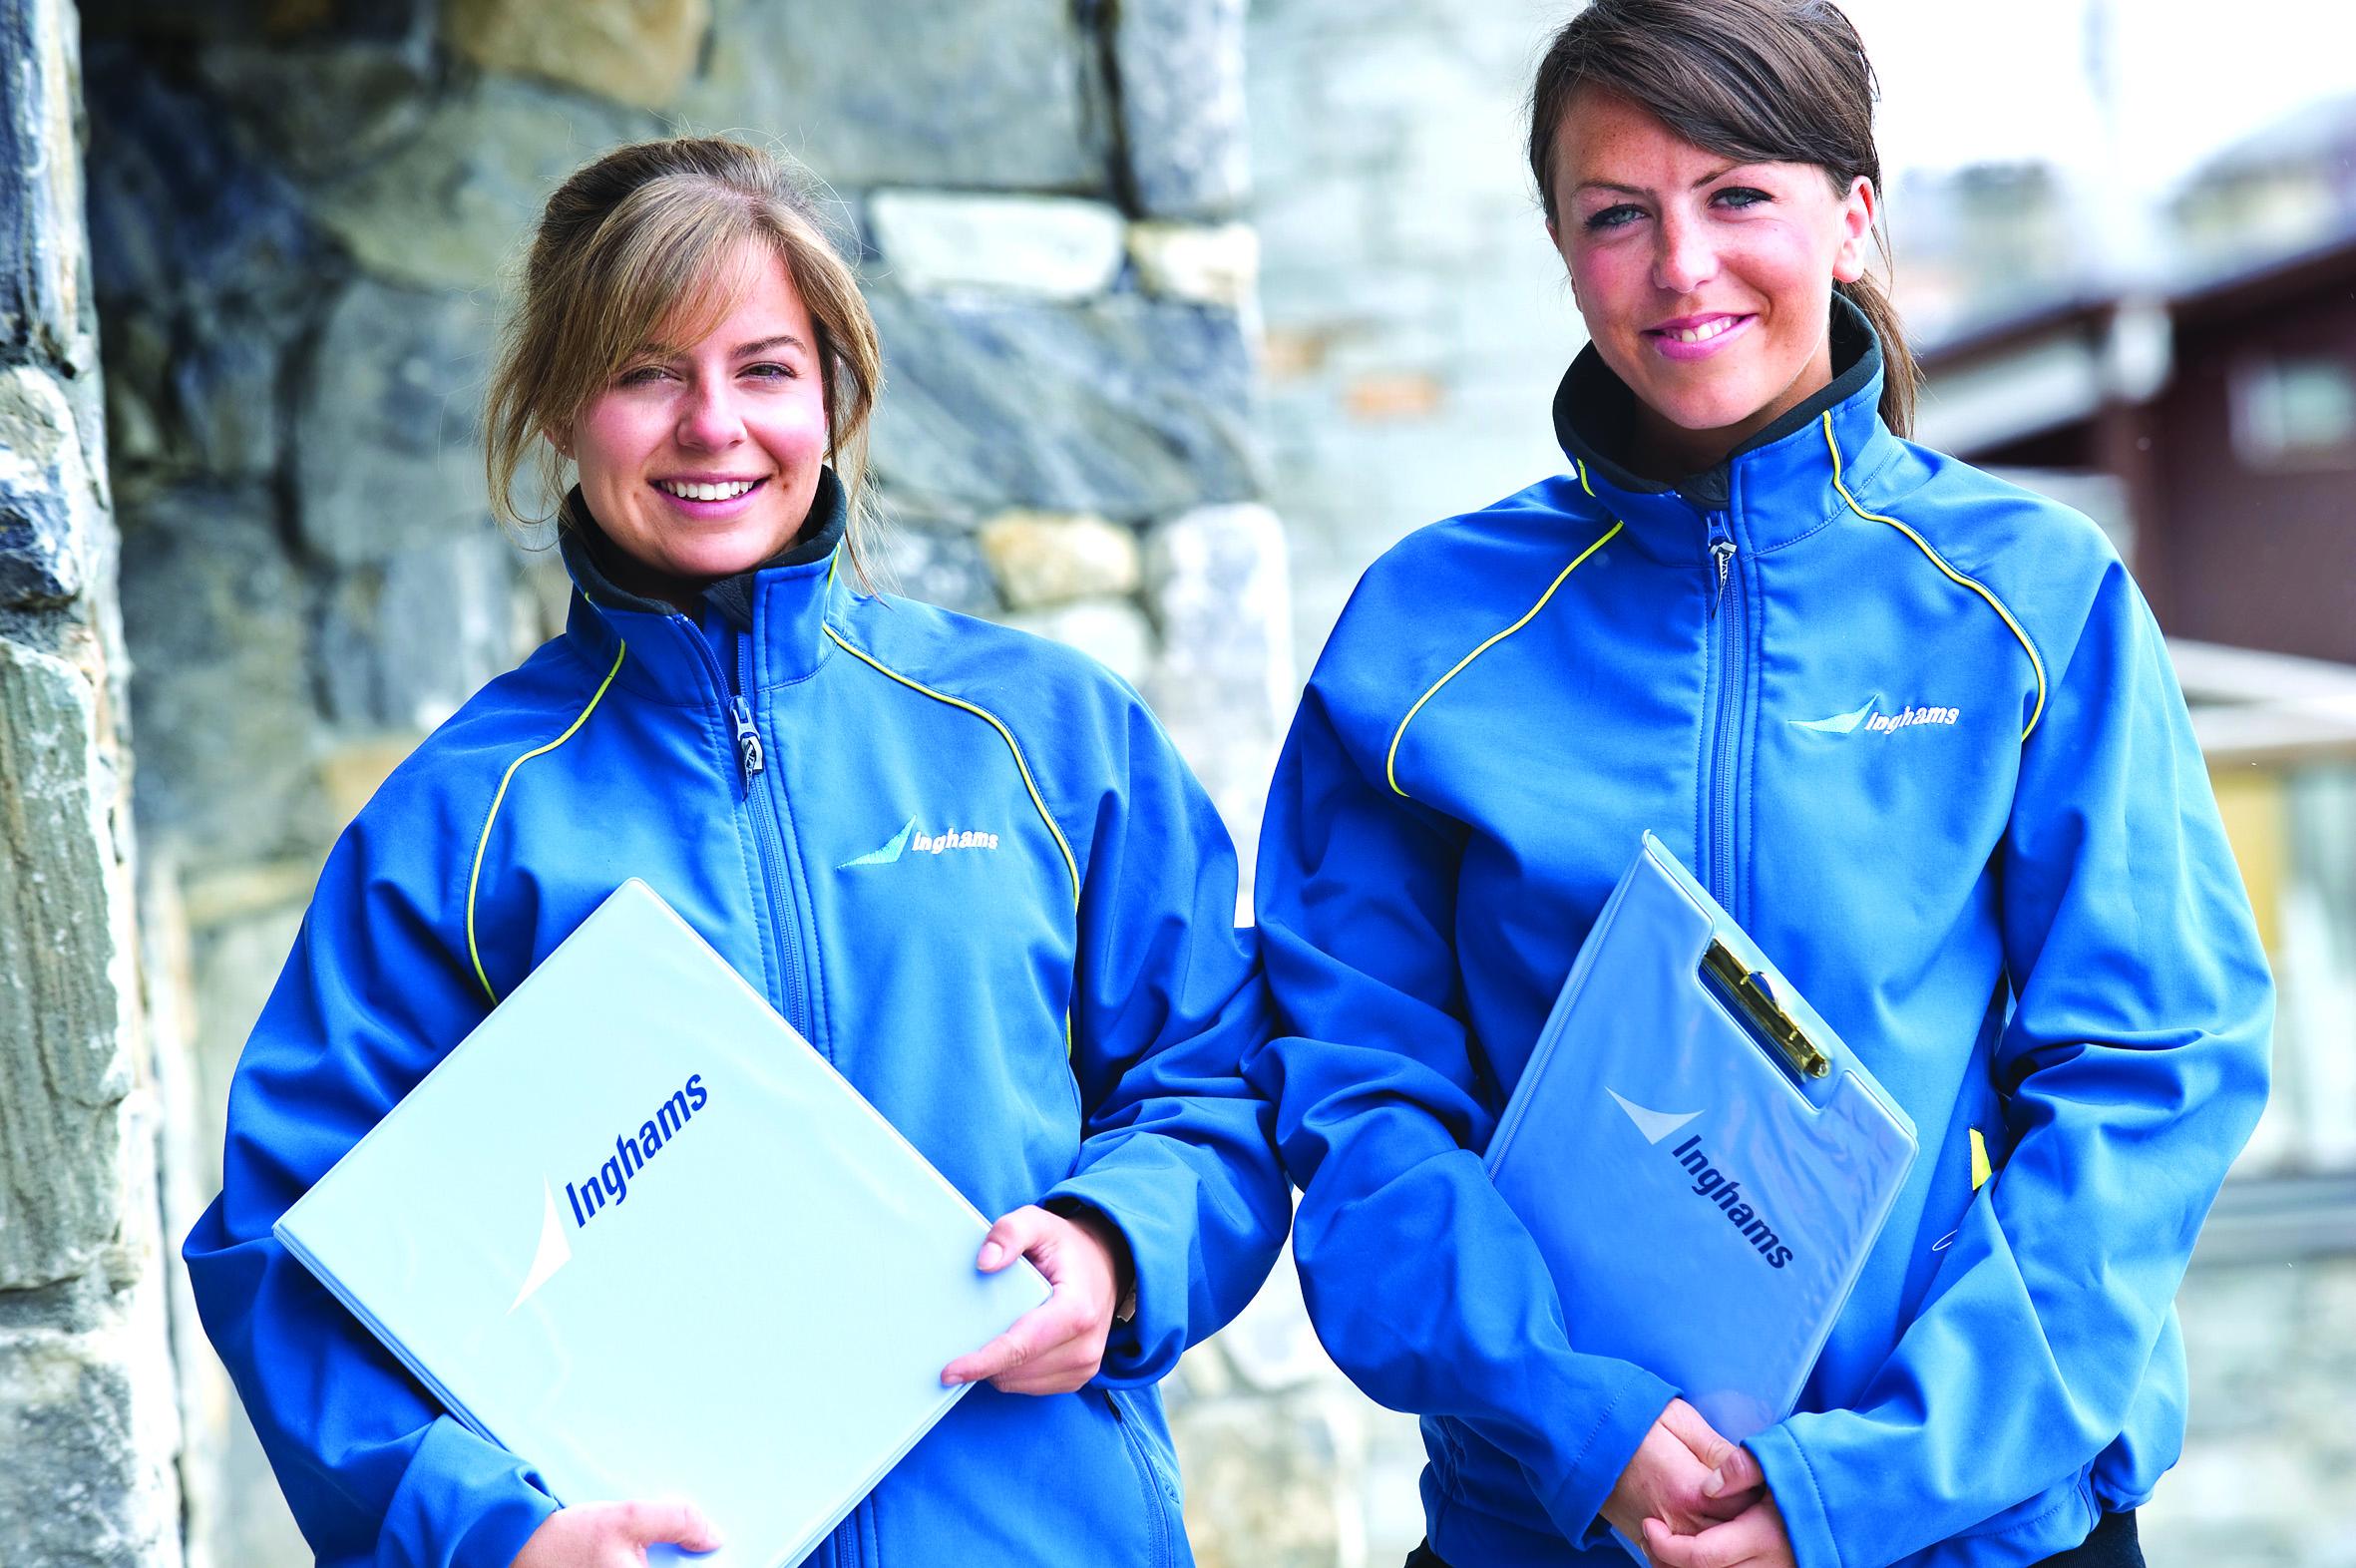 austria_arlberg-ski-area_st-anton_gampen_mountain-lodge-chalets_staff.jpg